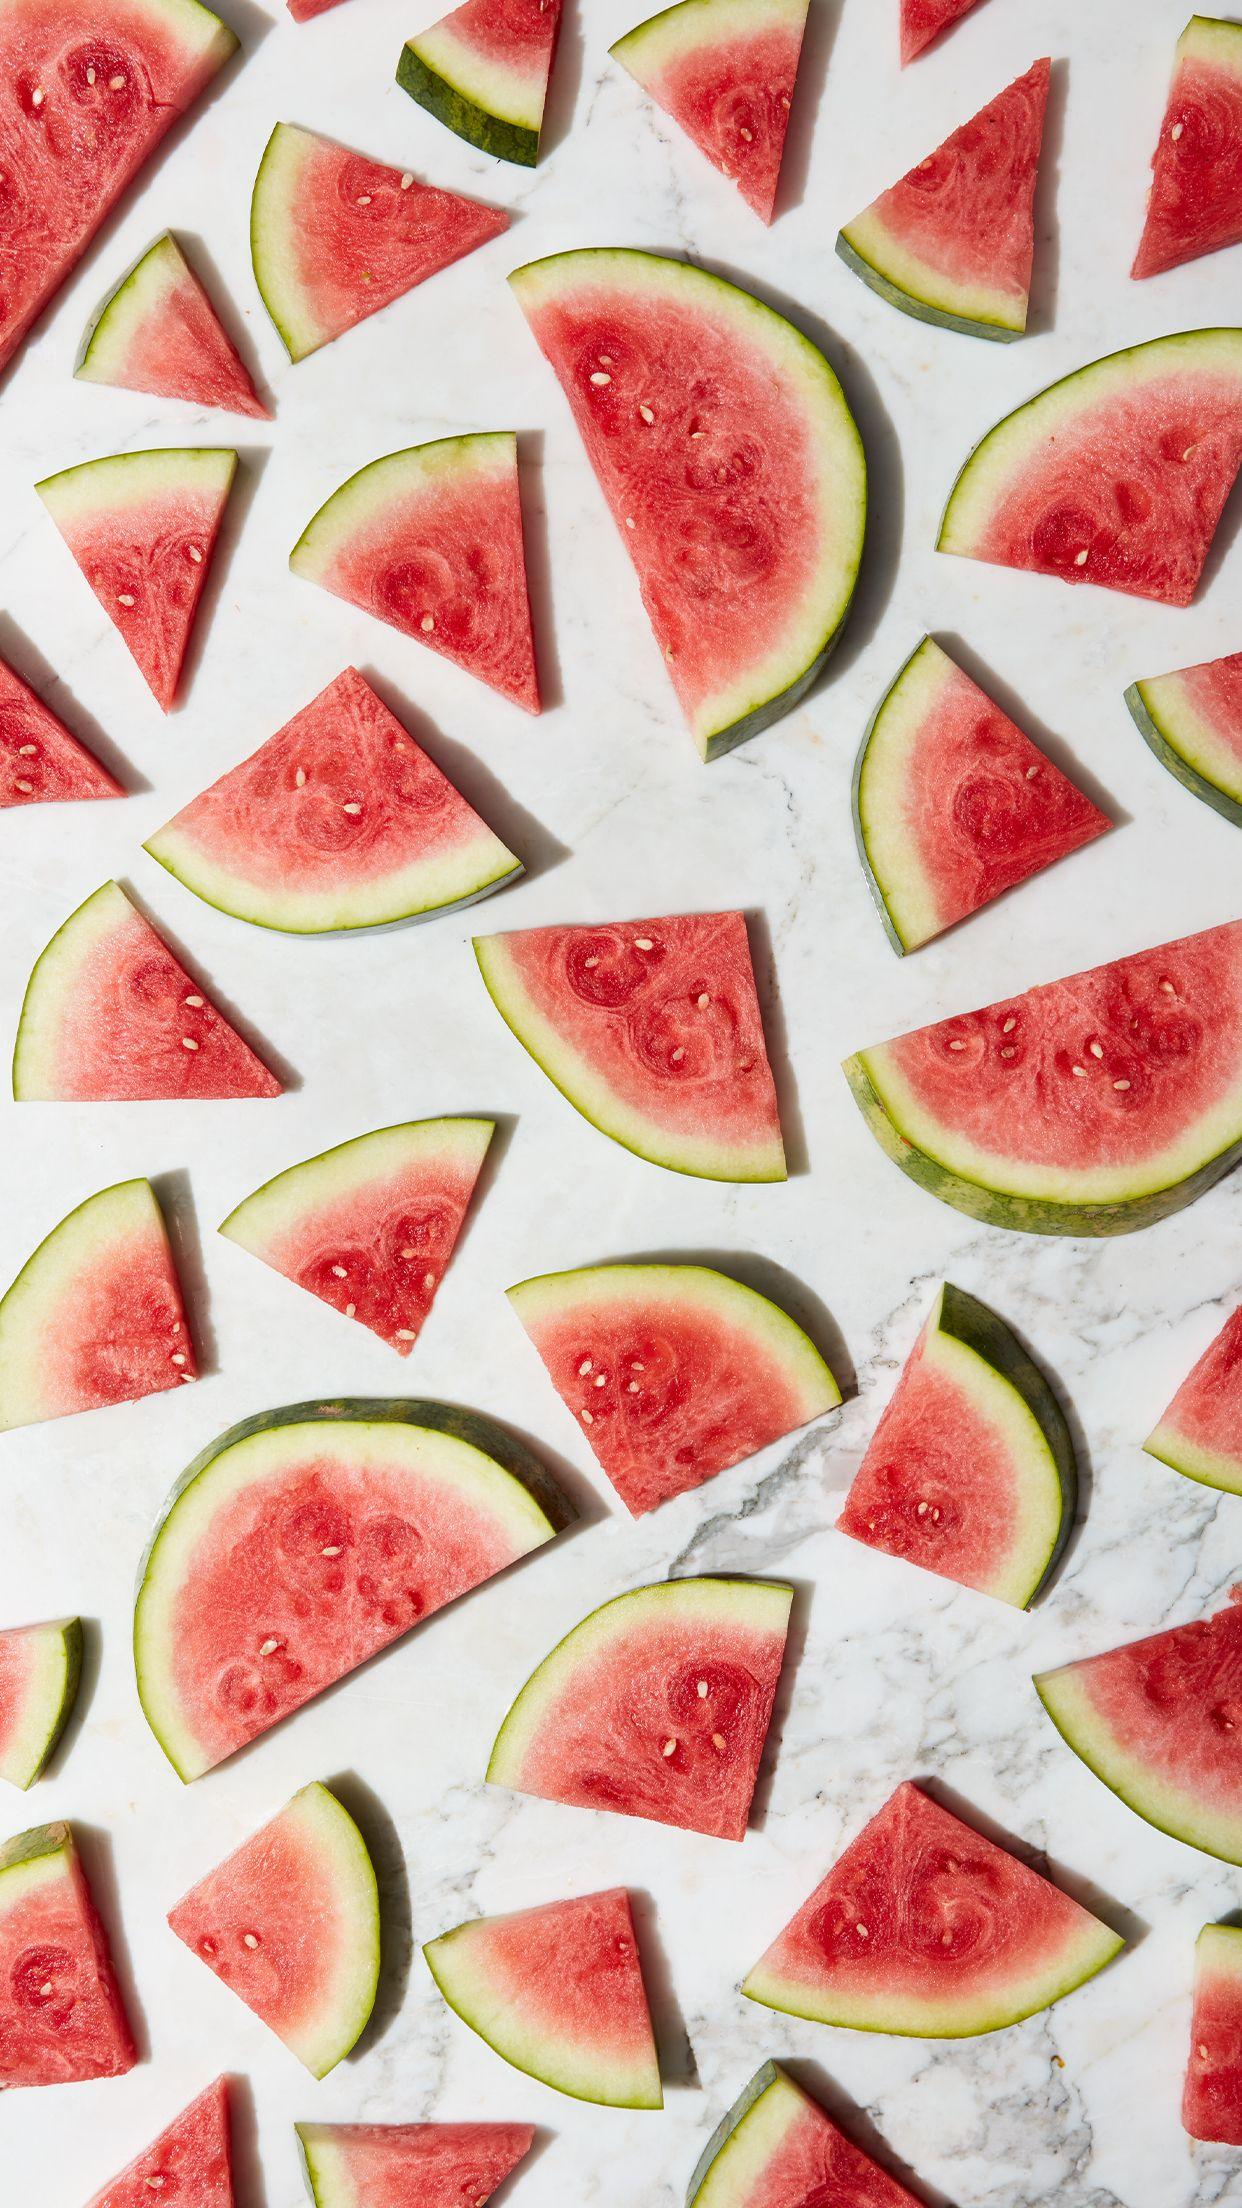 Watermelon Wallpaper Download Watermelon HD Wallpapers for ...